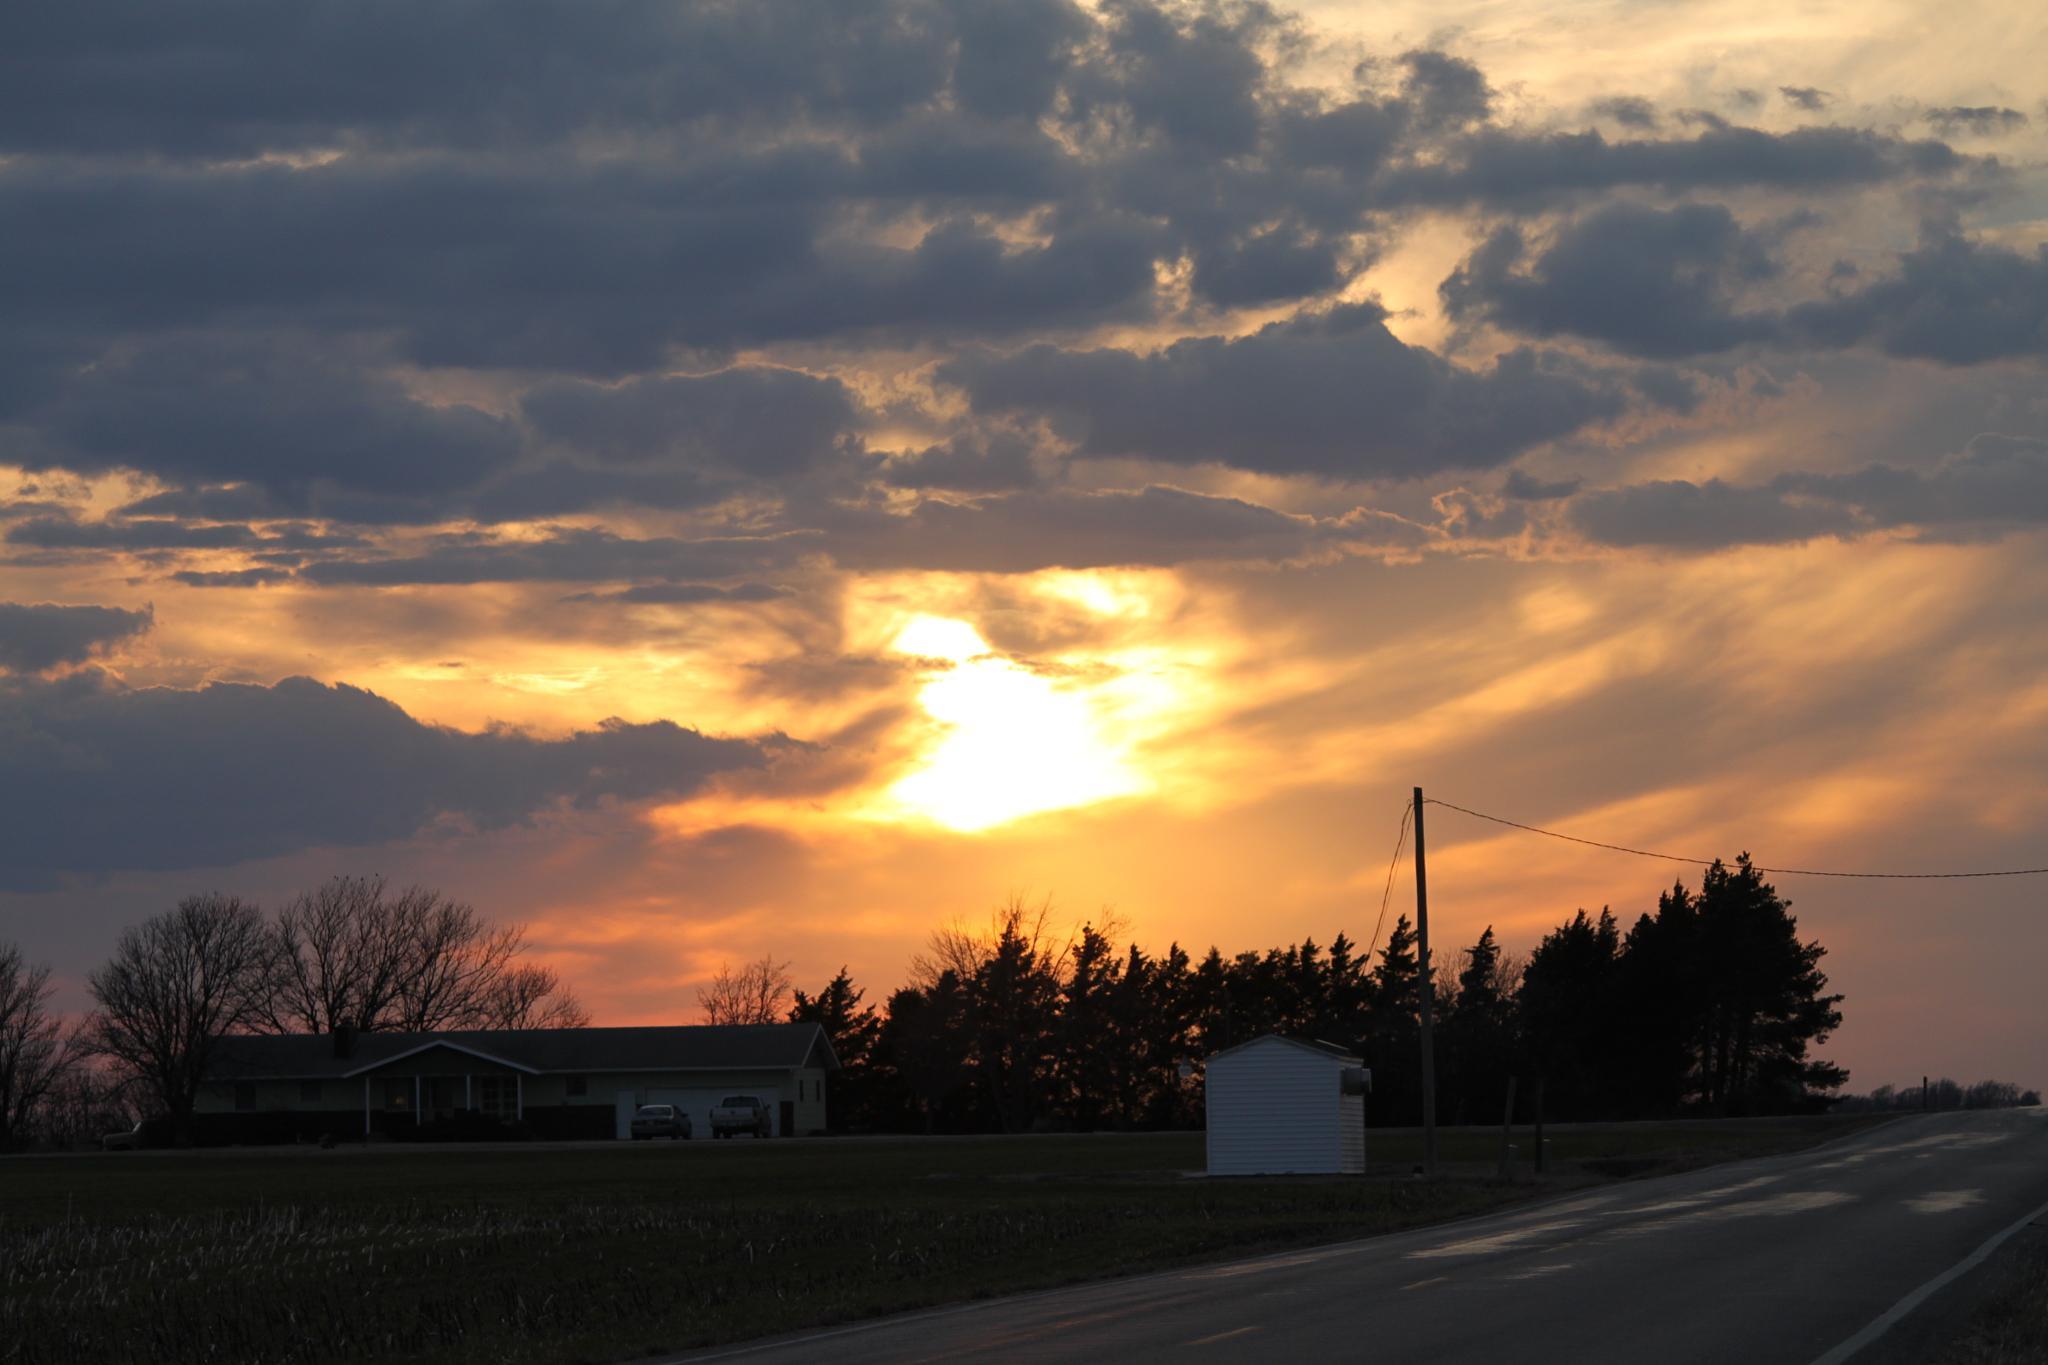 Sunset by pamela.raineri.1